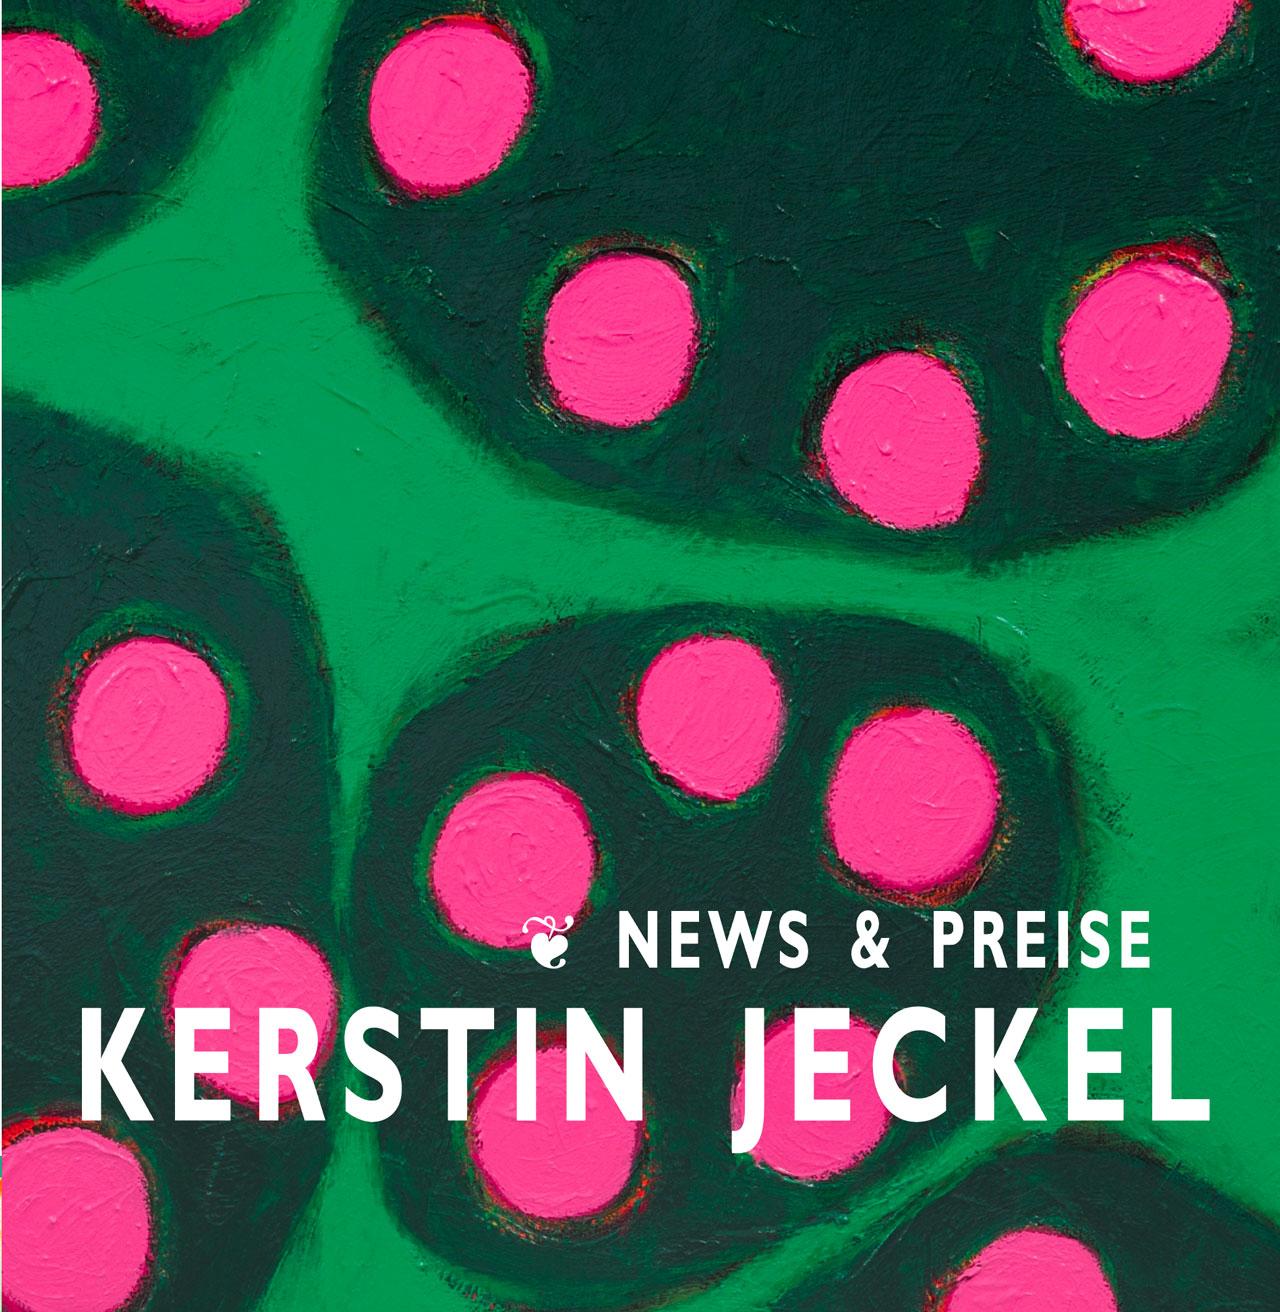 kerstin-jeckel-preise-titel-2019